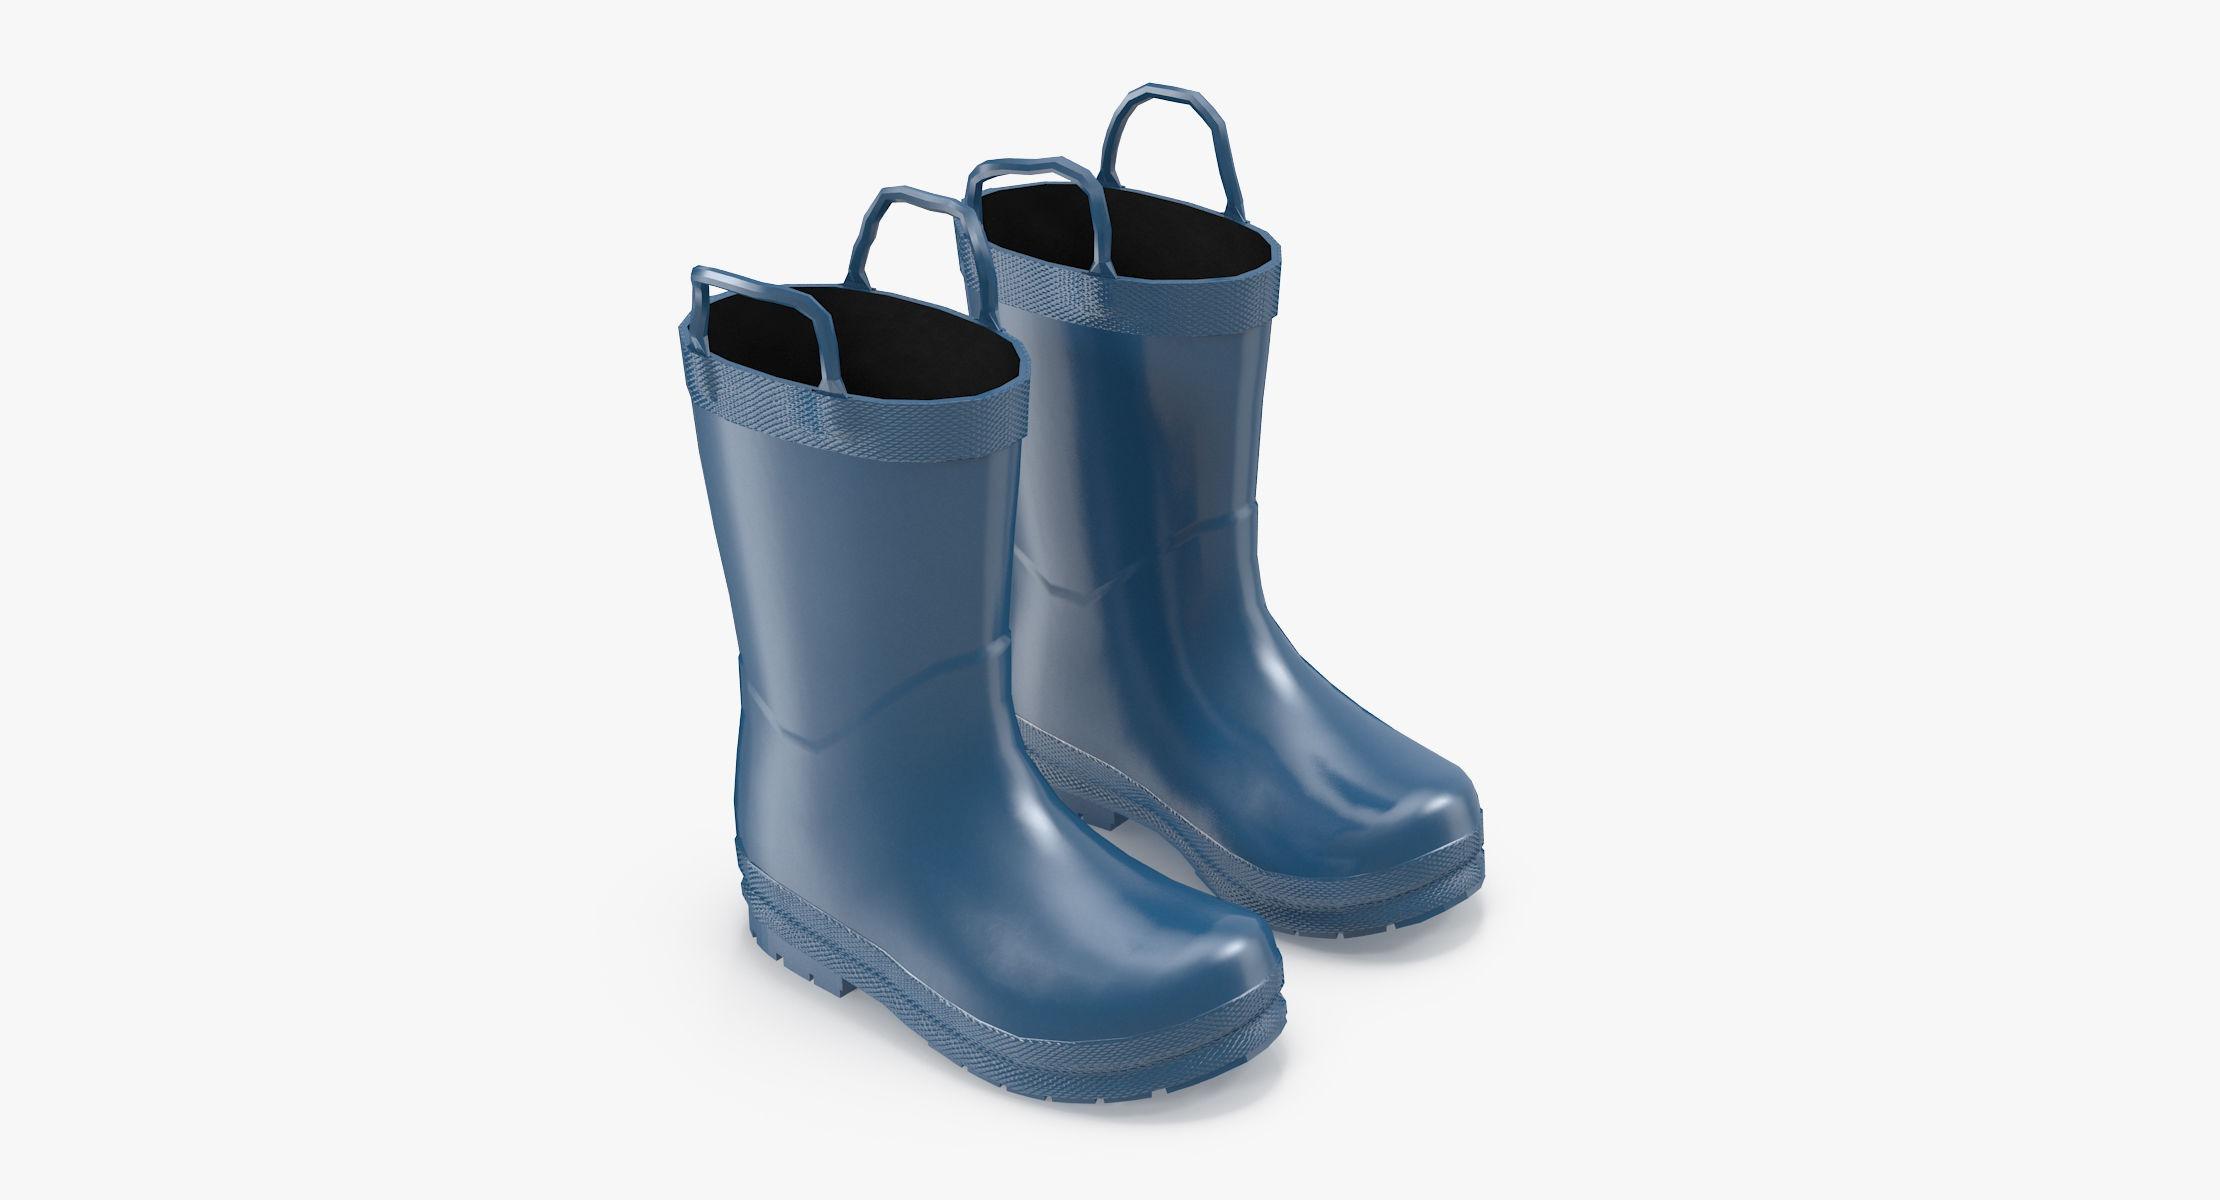 Kids Rain Boots - reel 1